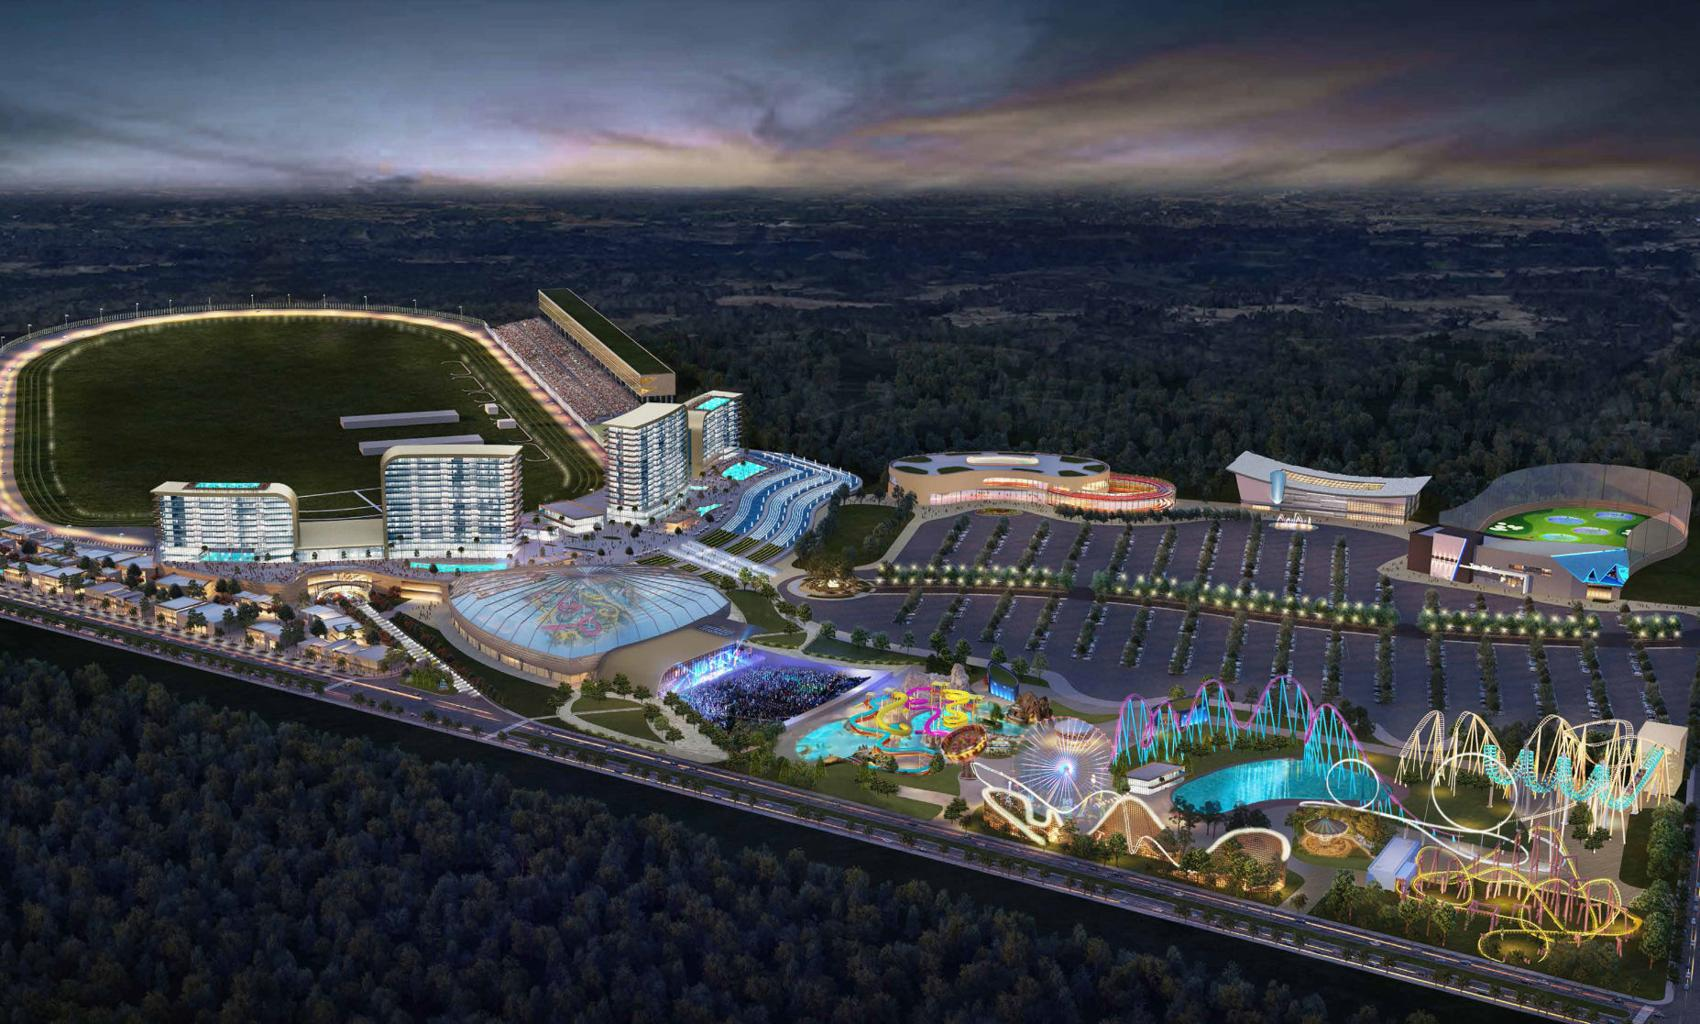 Extravagant renderings for Atlanta Motor Speedway casino resort complex unveiled